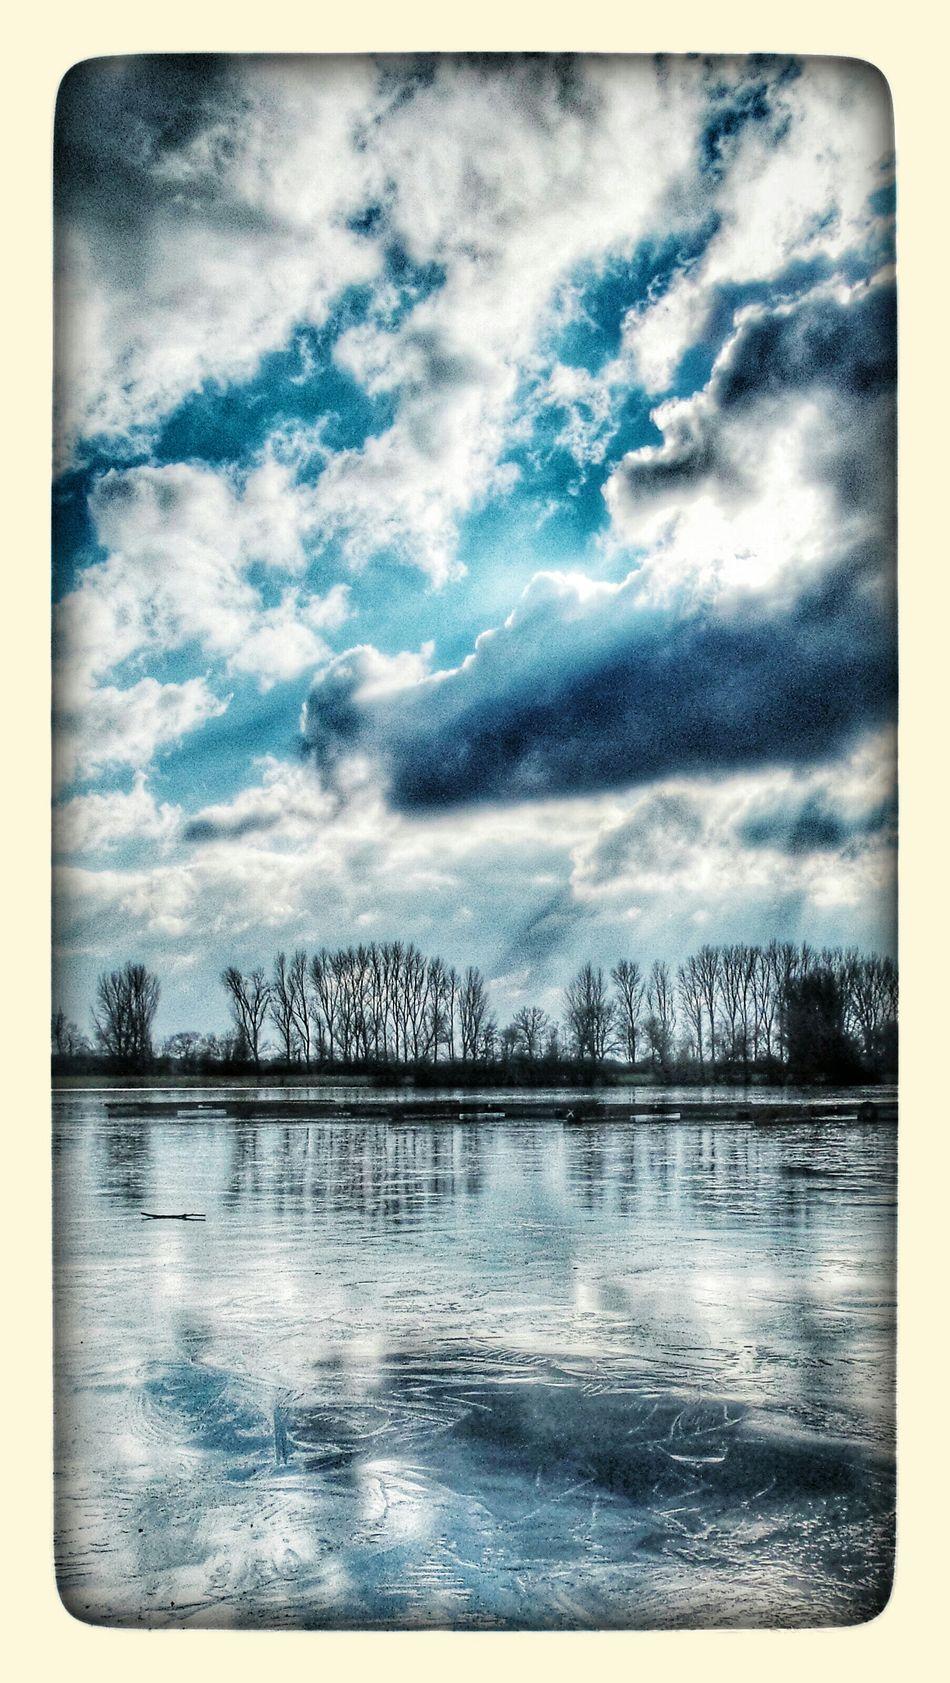 noch ist es kalt, aber... Taking Photos Enjoying Life Winter-time In Germany First Eyeem Photo My Hobby